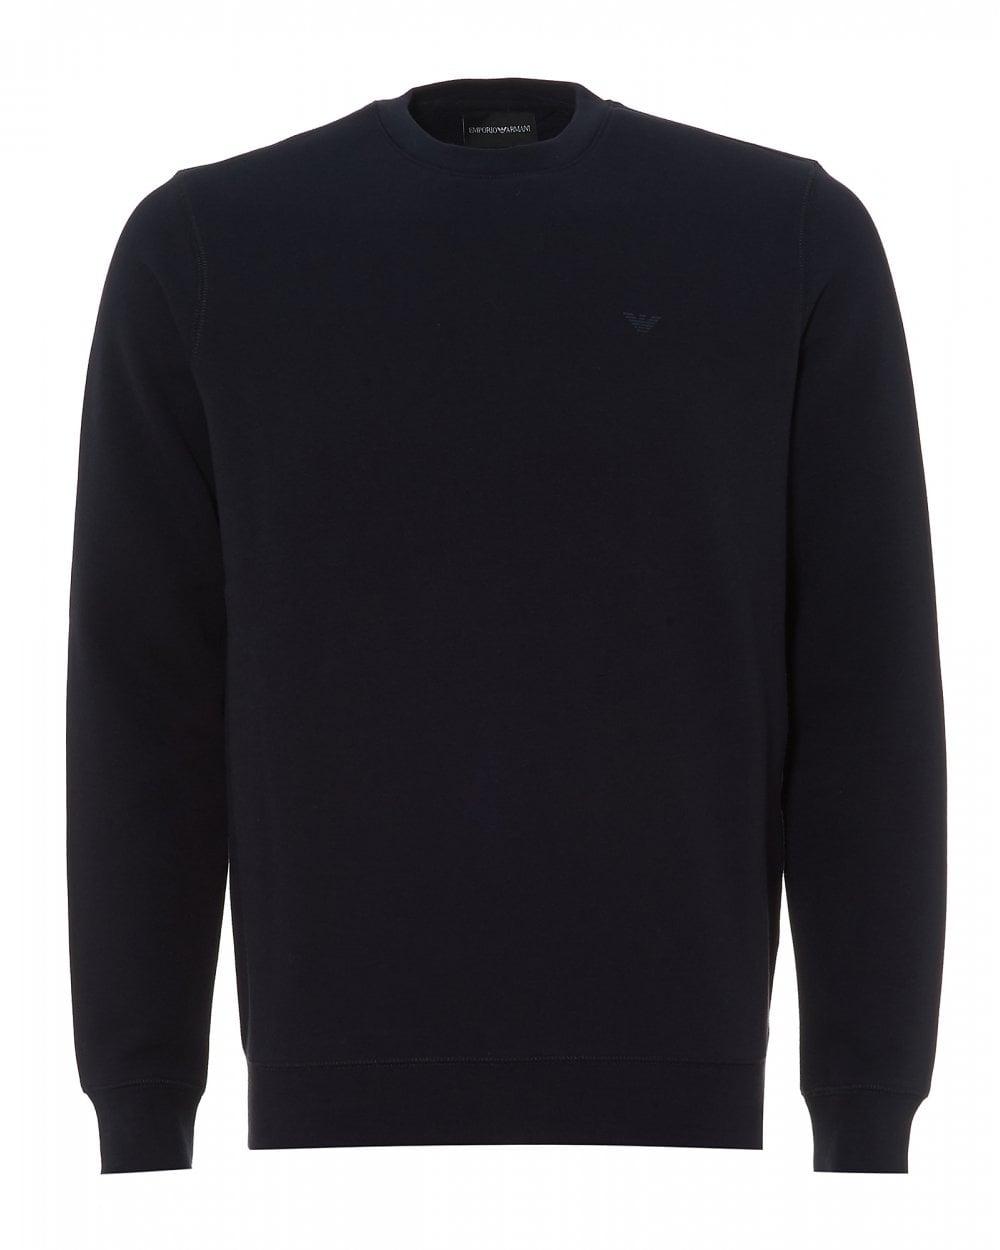 e15f6ad4a9976 Emporio Armani Mens Small Logo Sweatshirt, Navy Blue Crew Neck Sweat